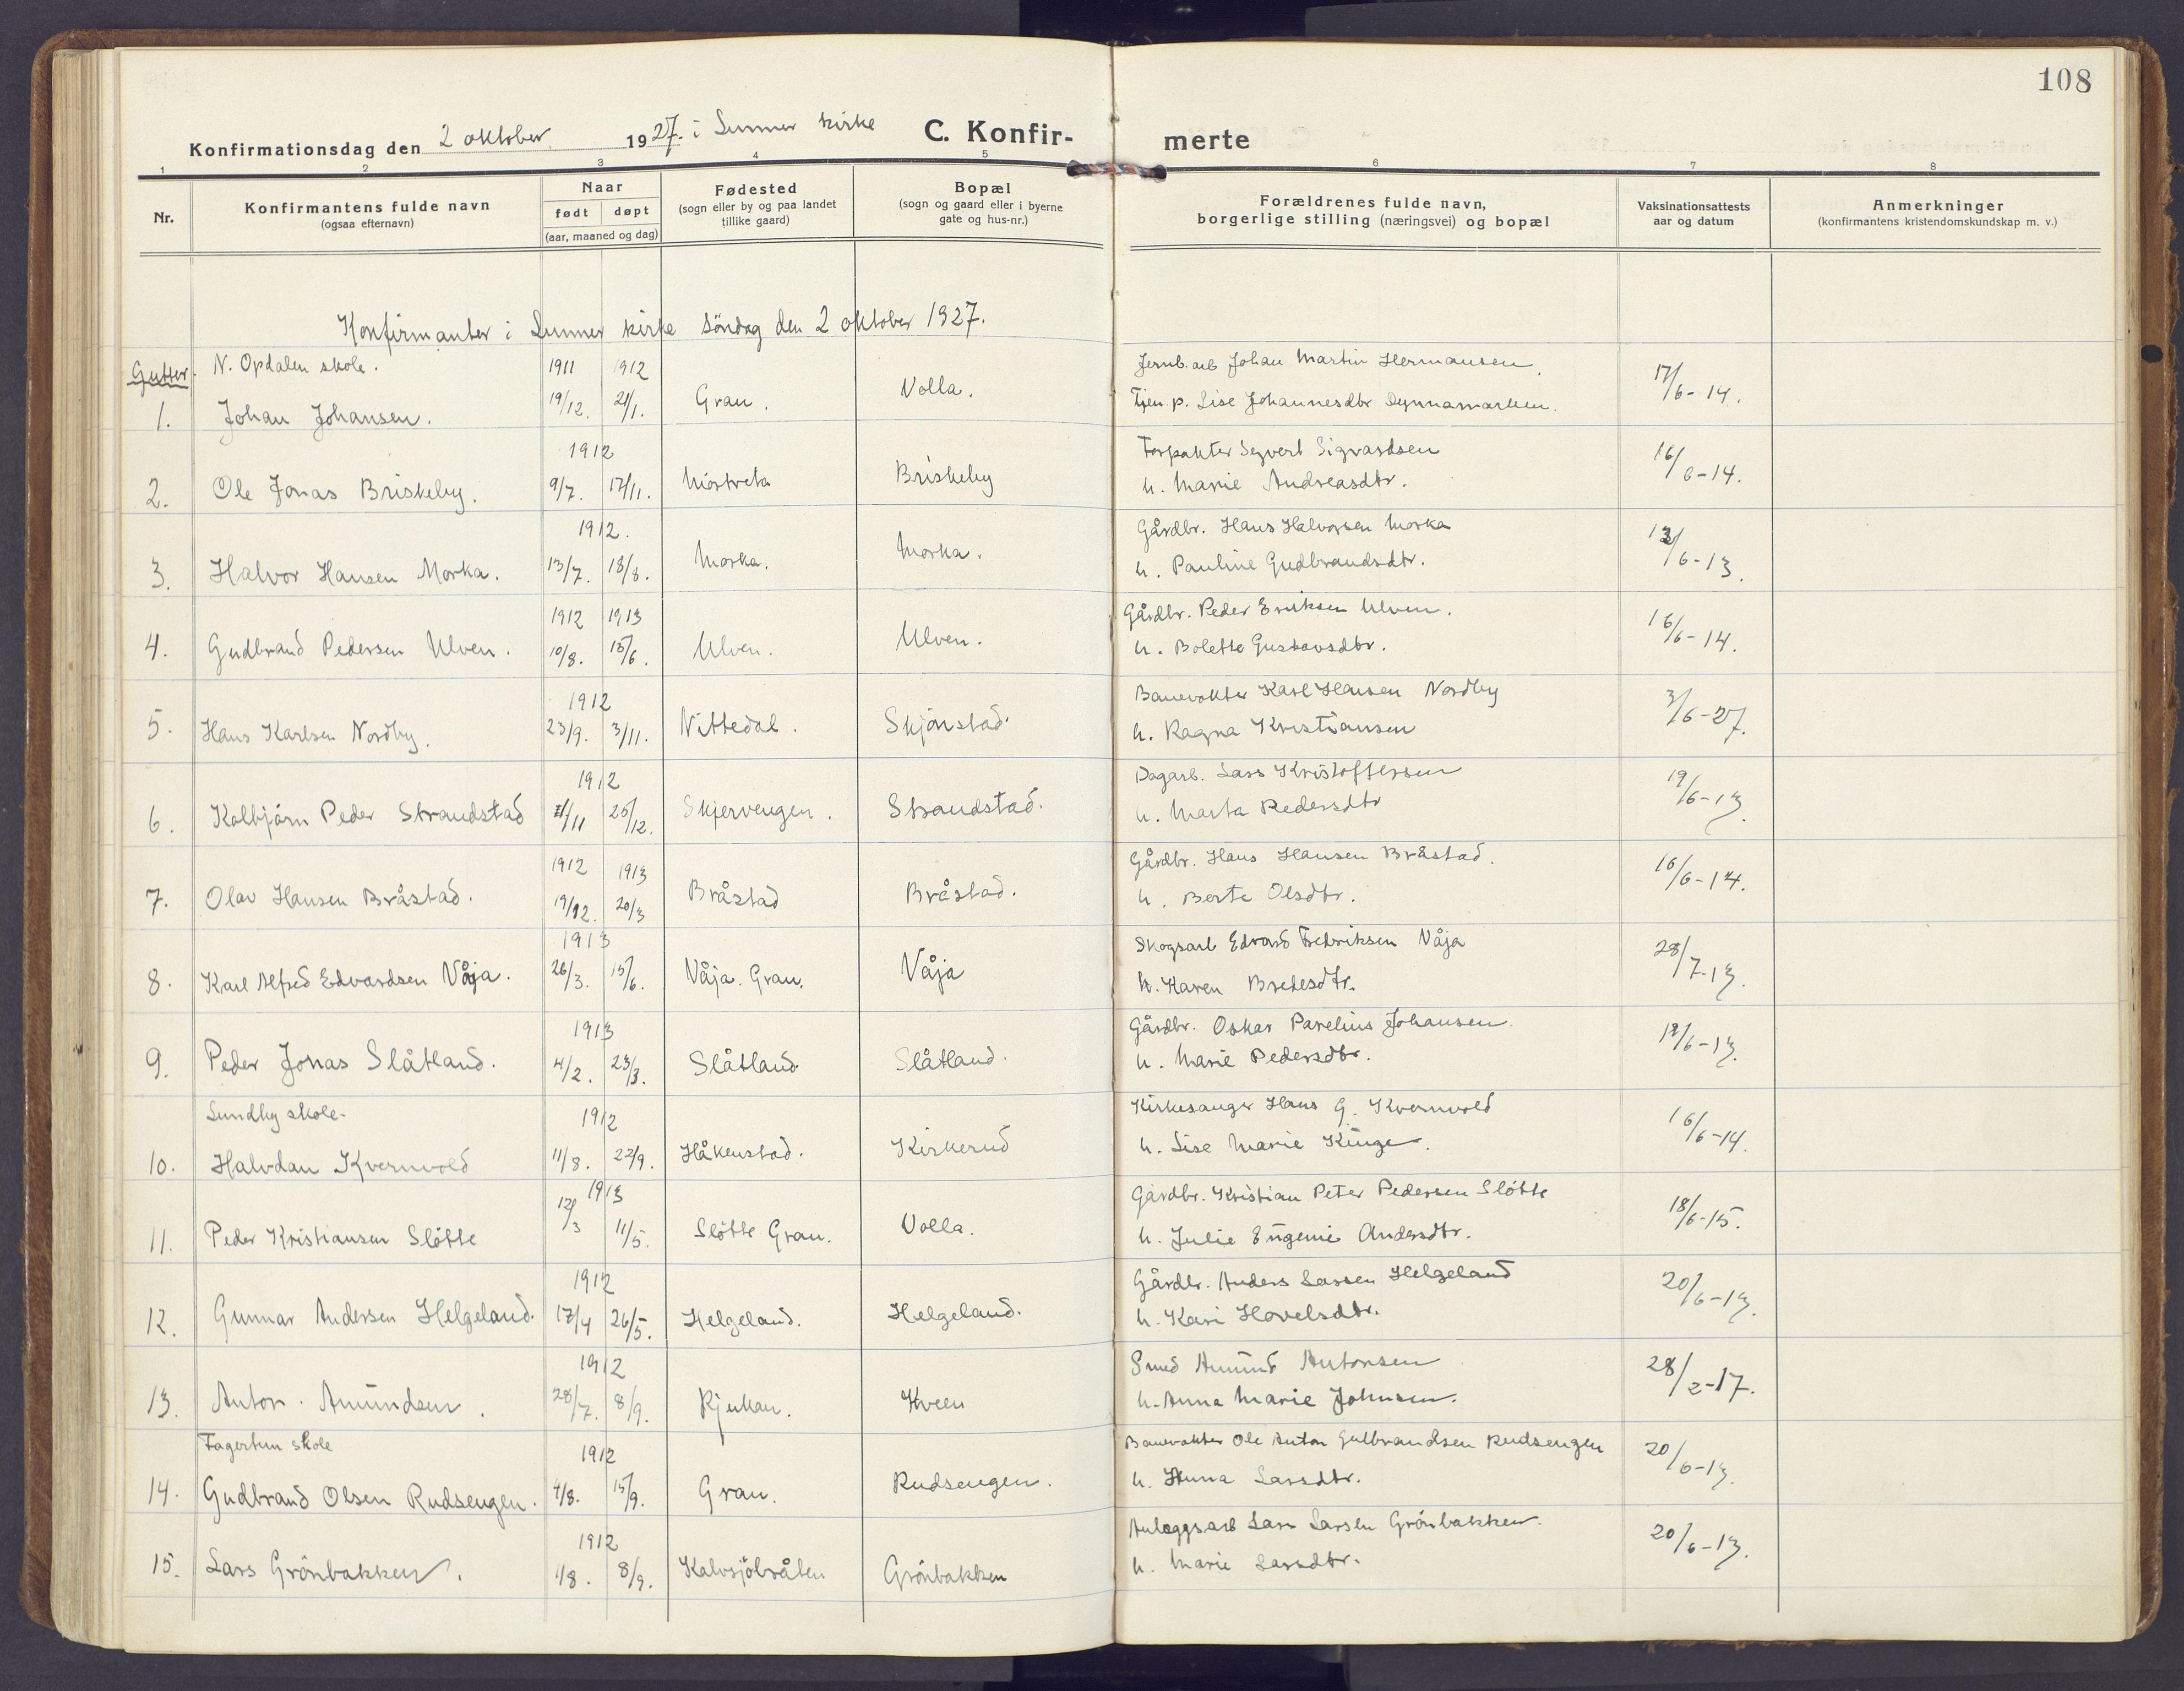 SAH, Lunner prestekontor, H/Ha/Haa/L0002: Ministerialbok nr. 2, 1922-1931, s. 108